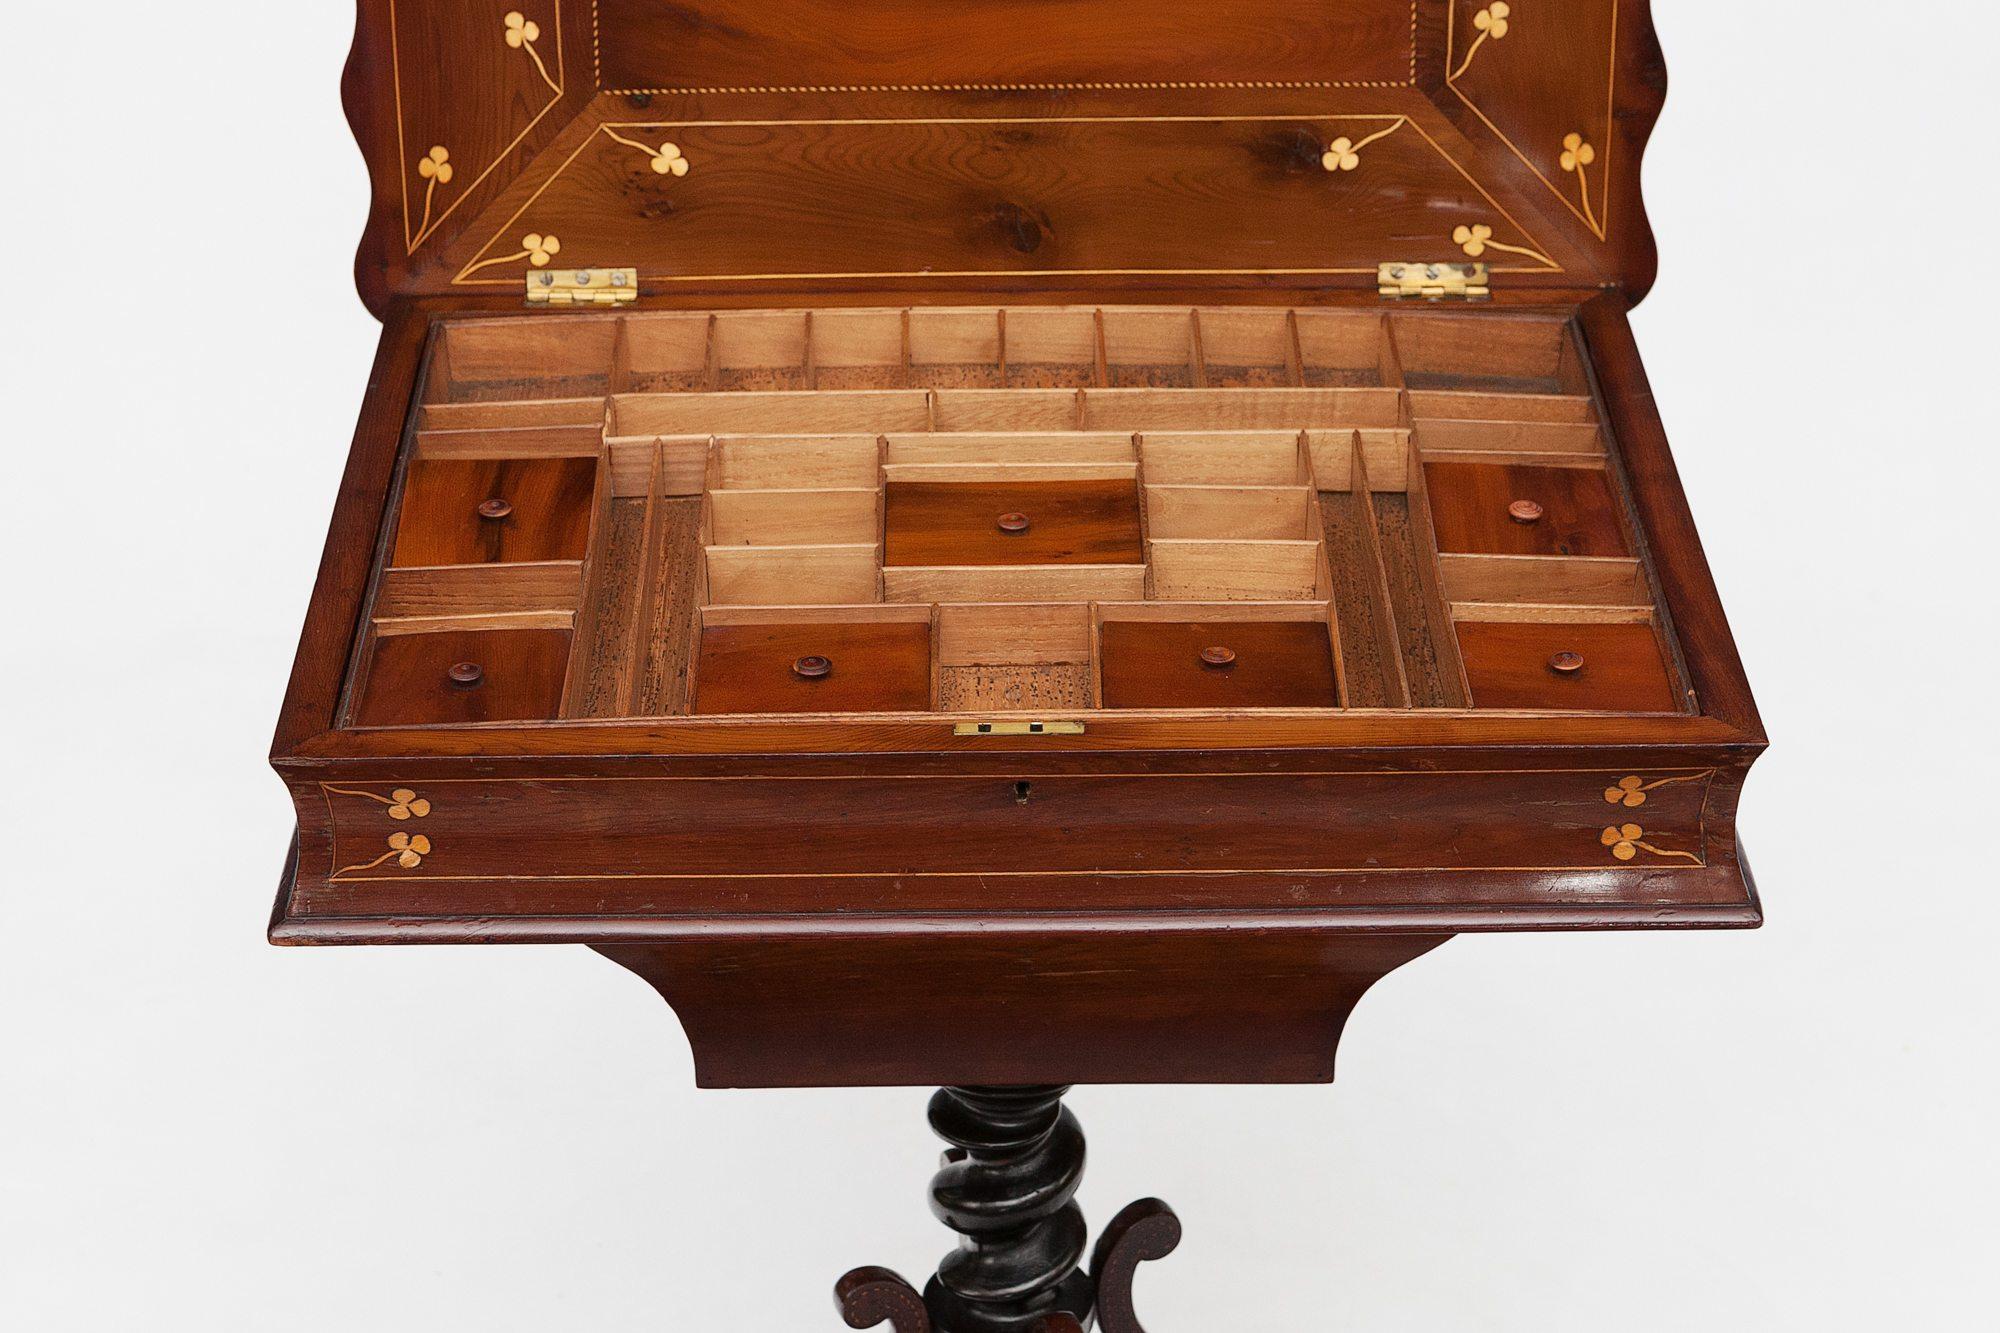 9604 19th Century Killarney Ware Marquetry Work Table